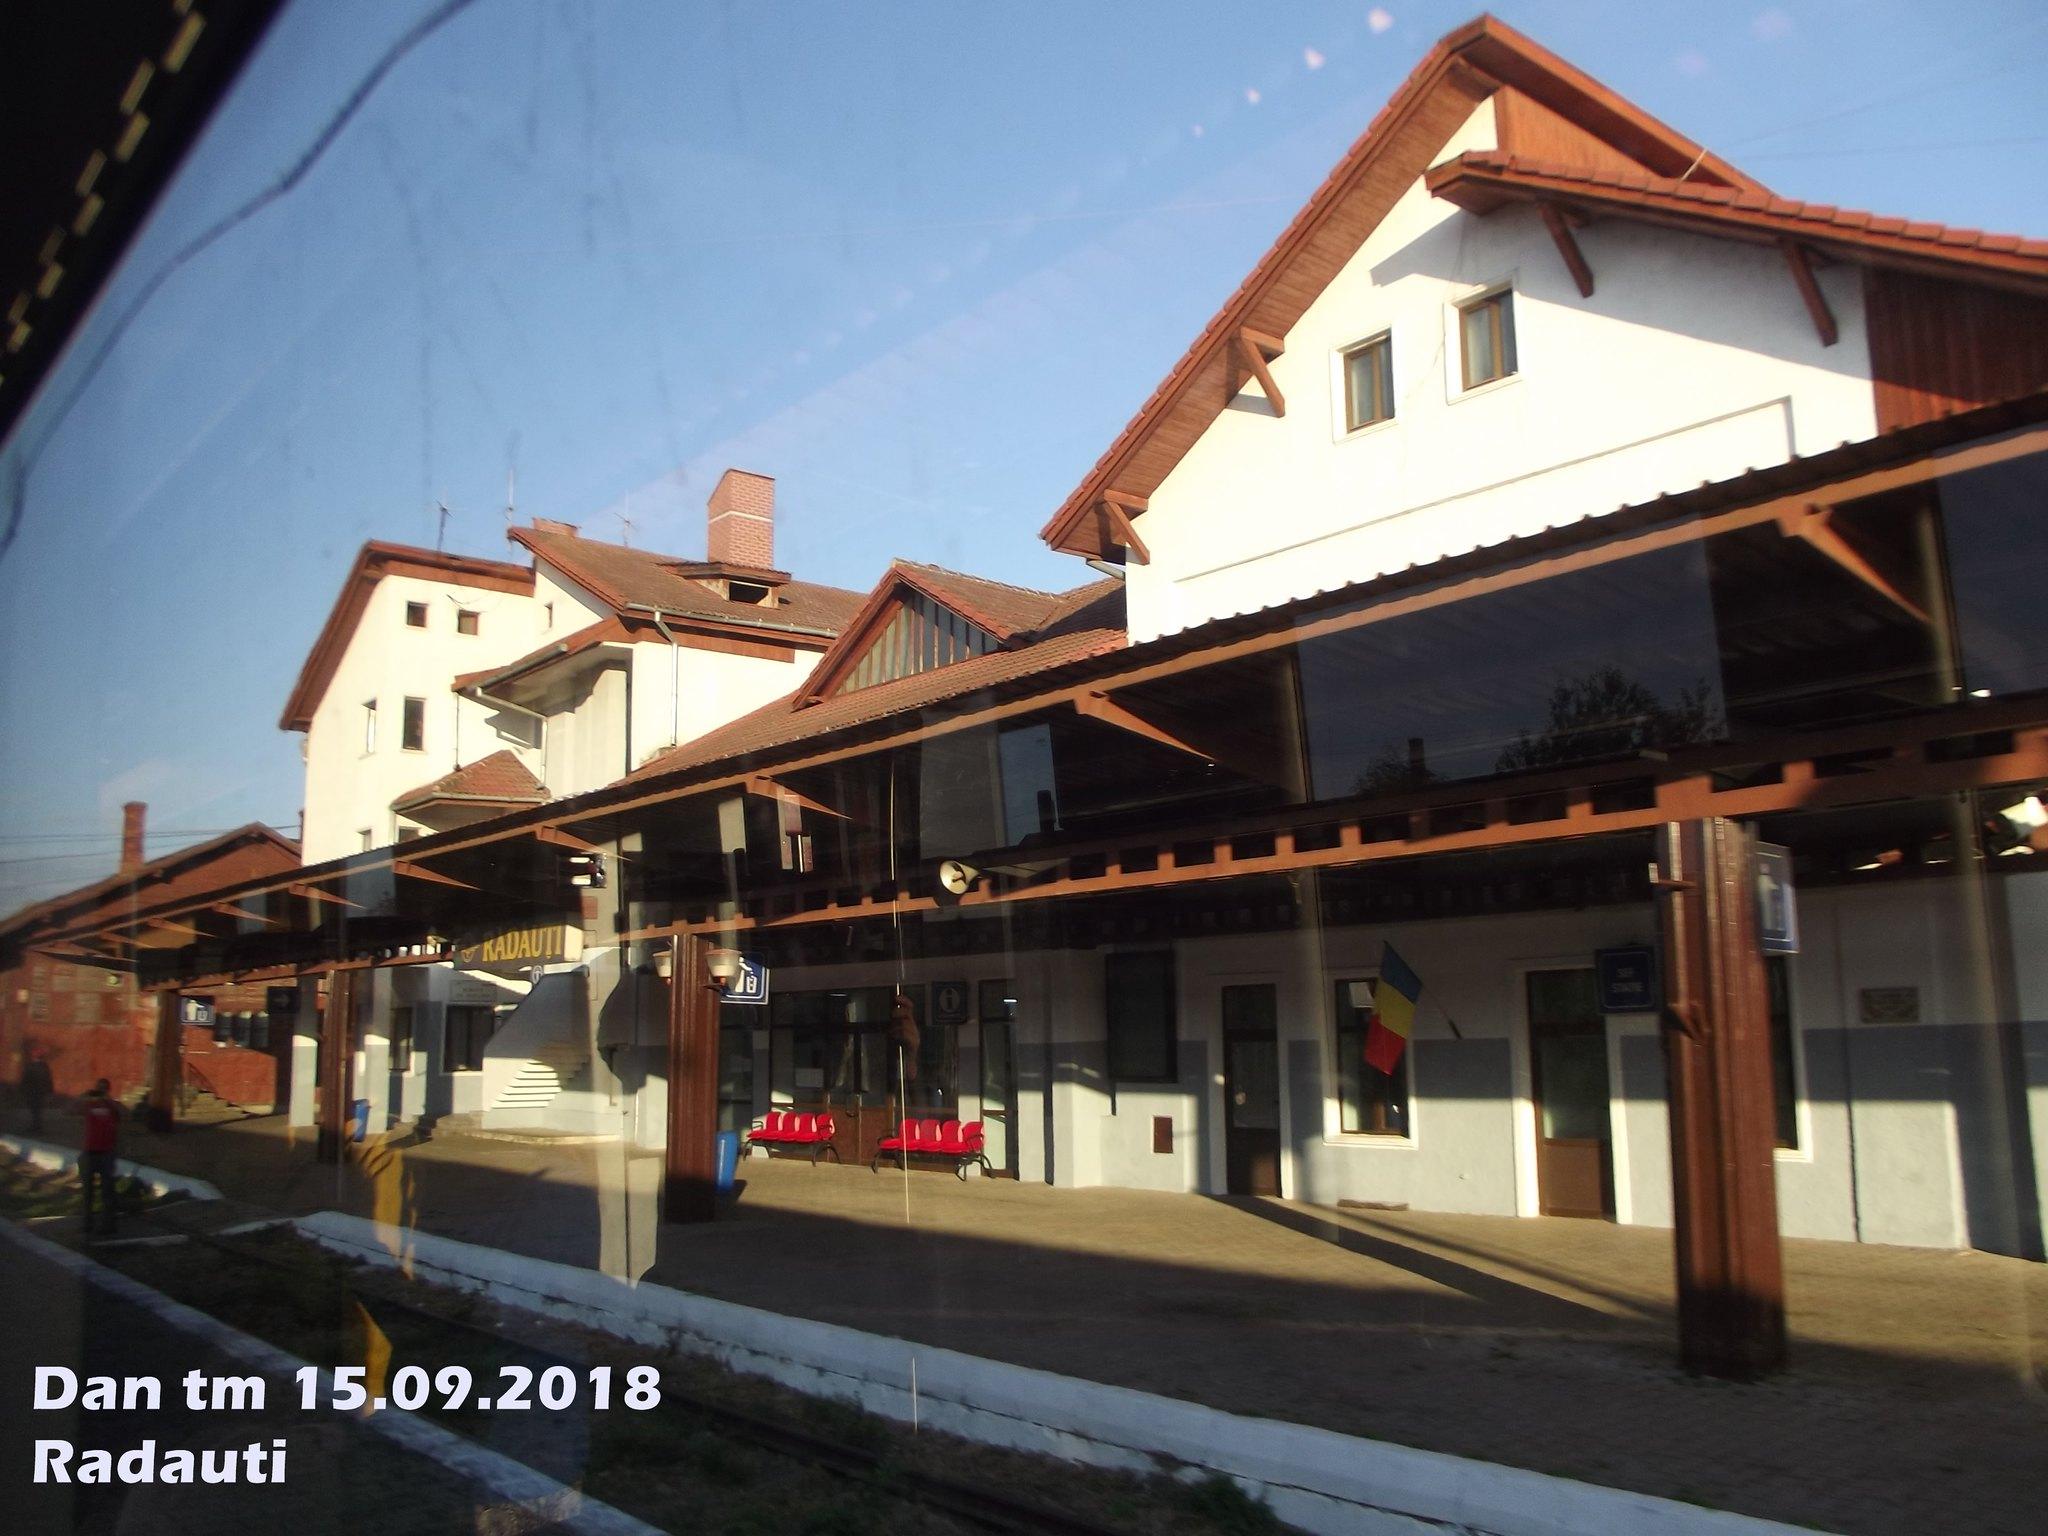 515 : Dorneşti - Gura Putnei - (Putna) - Nisipitu - Seletin UKR - Pagina 47 43826160215_bf08d2ea6a_k